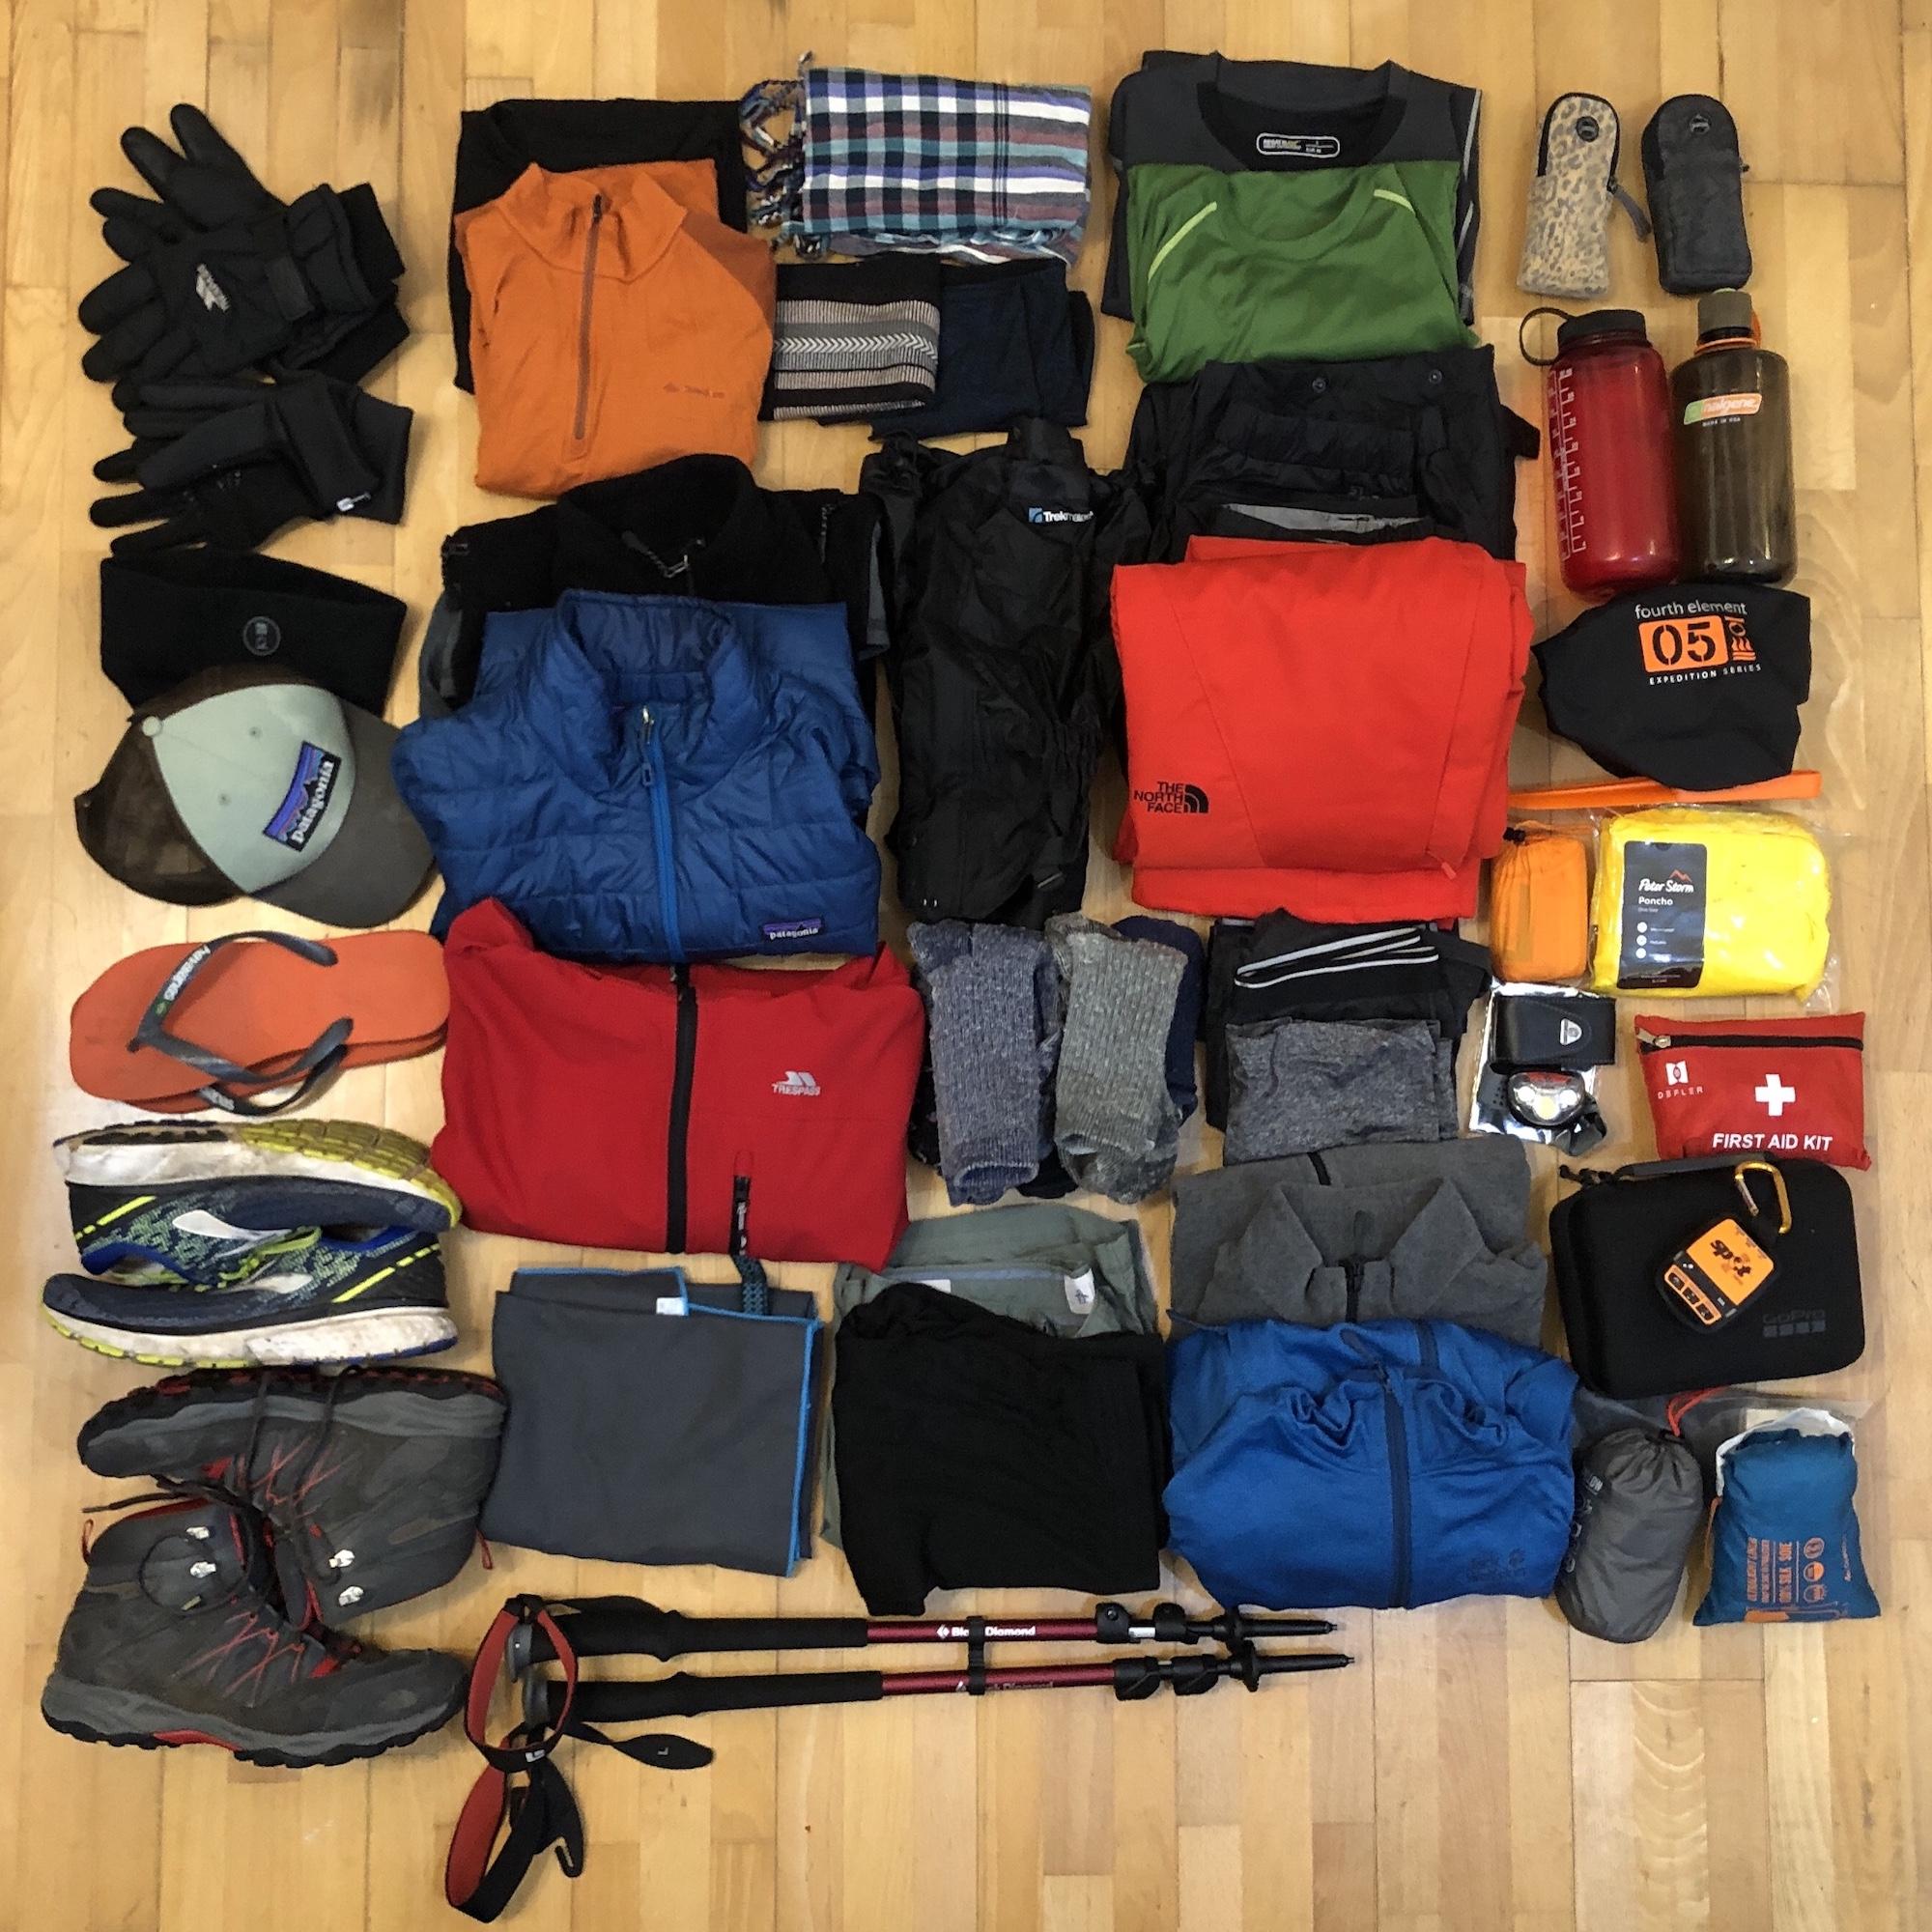 My kit for the Kili trek